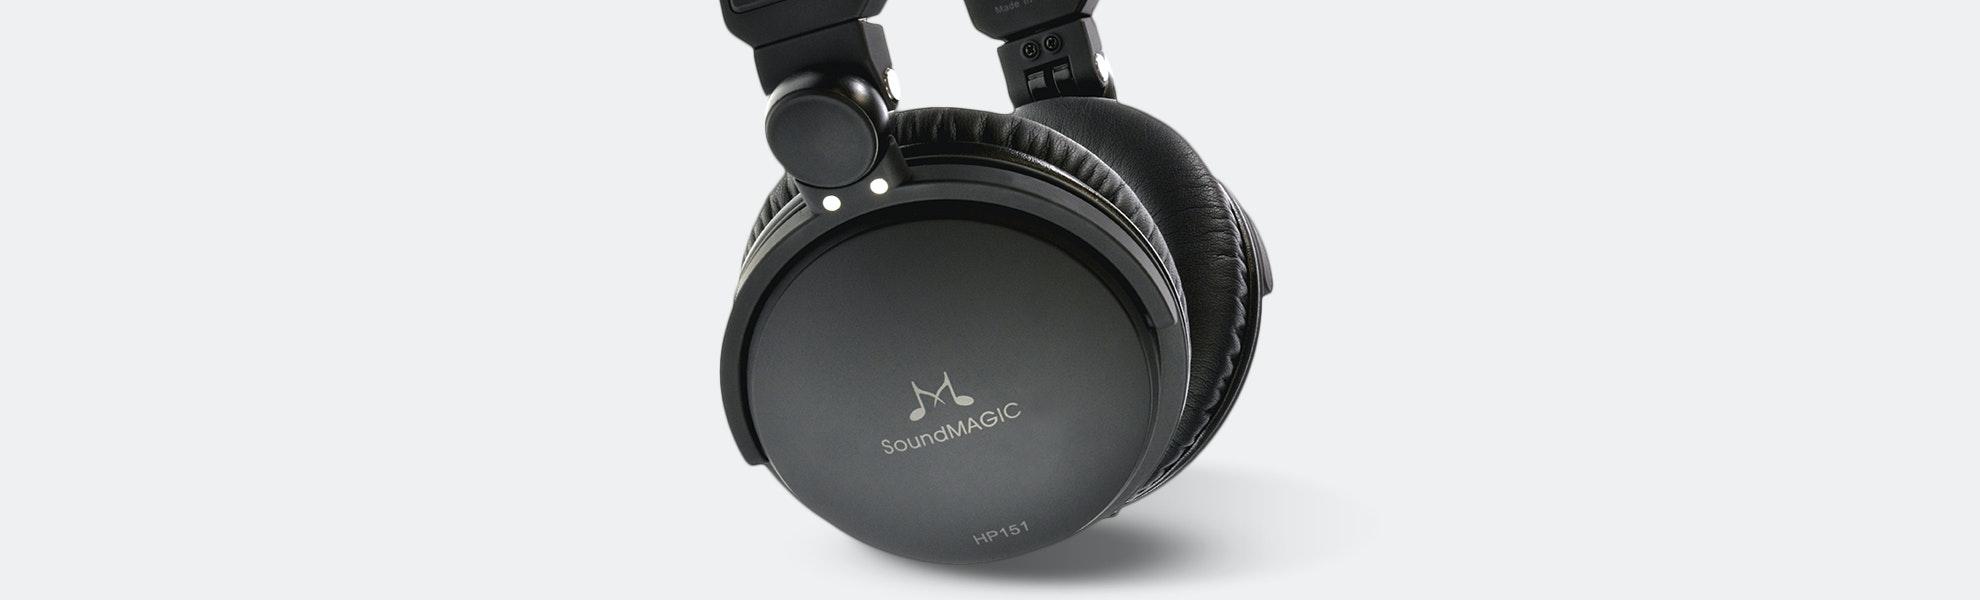 SoundMAGIC HP151 Headphones